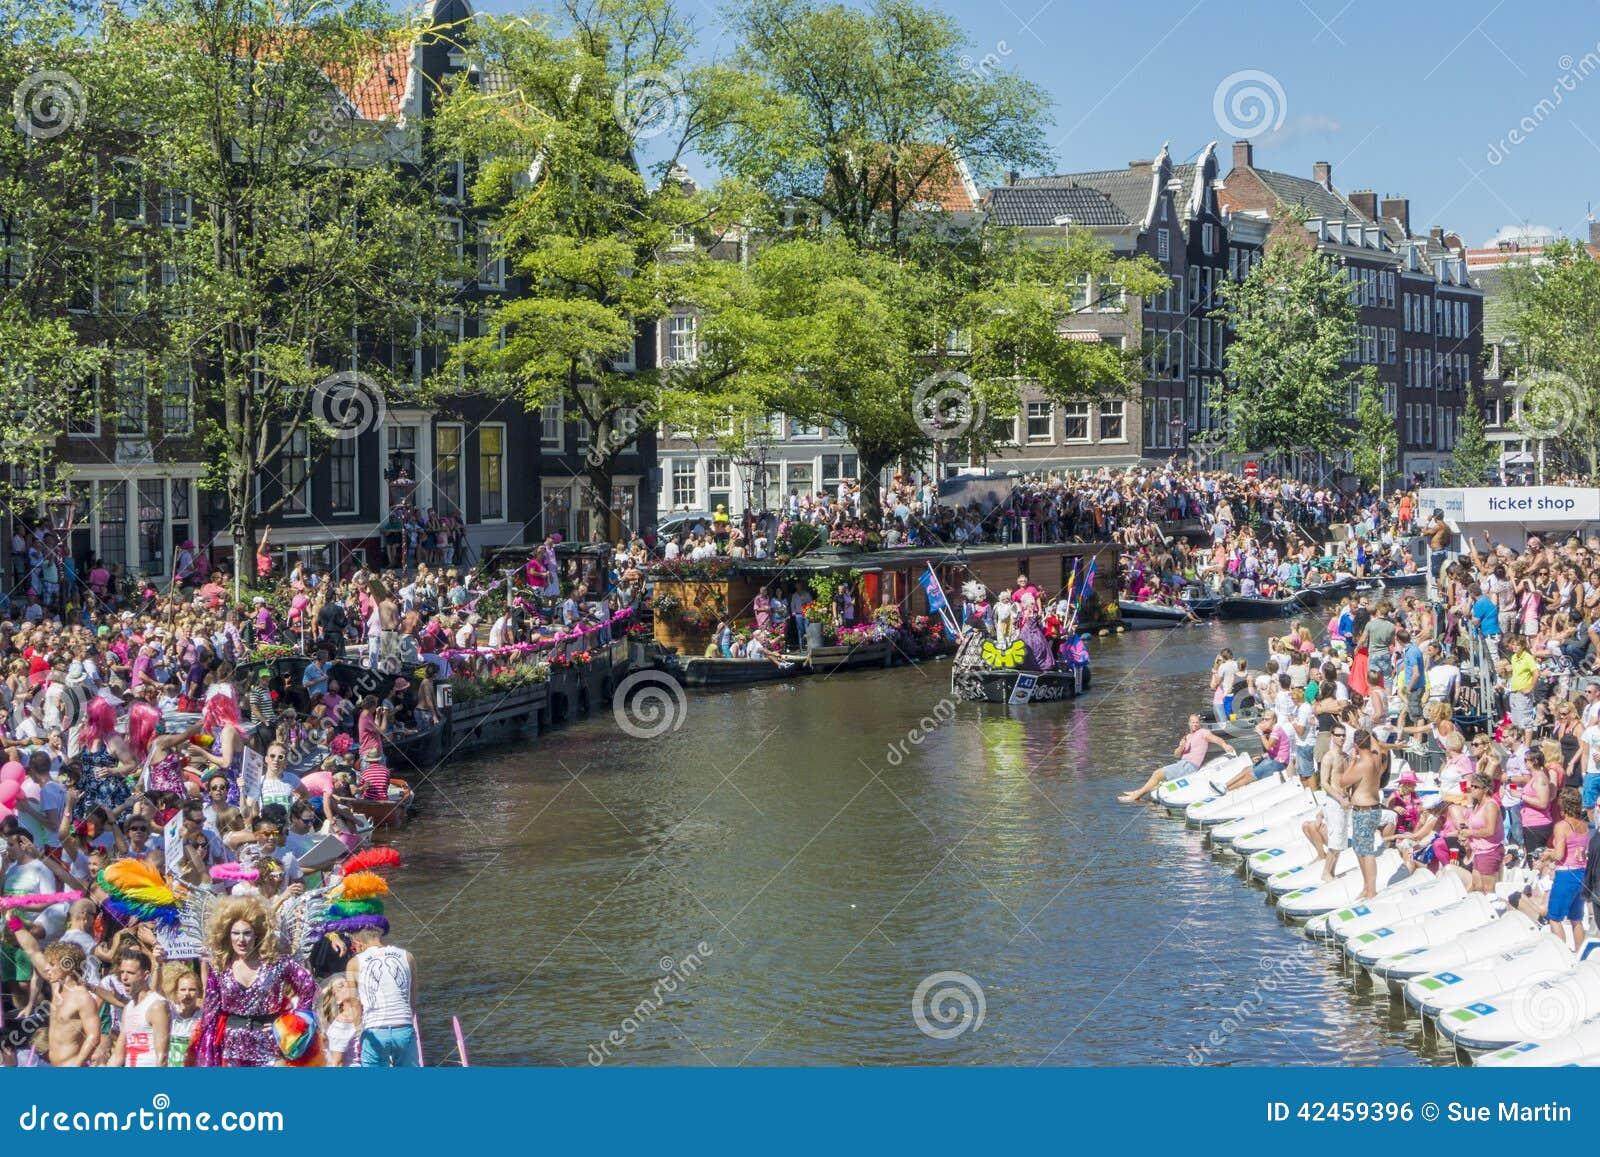 Homosexuelles Pride Amsterdam August 2013